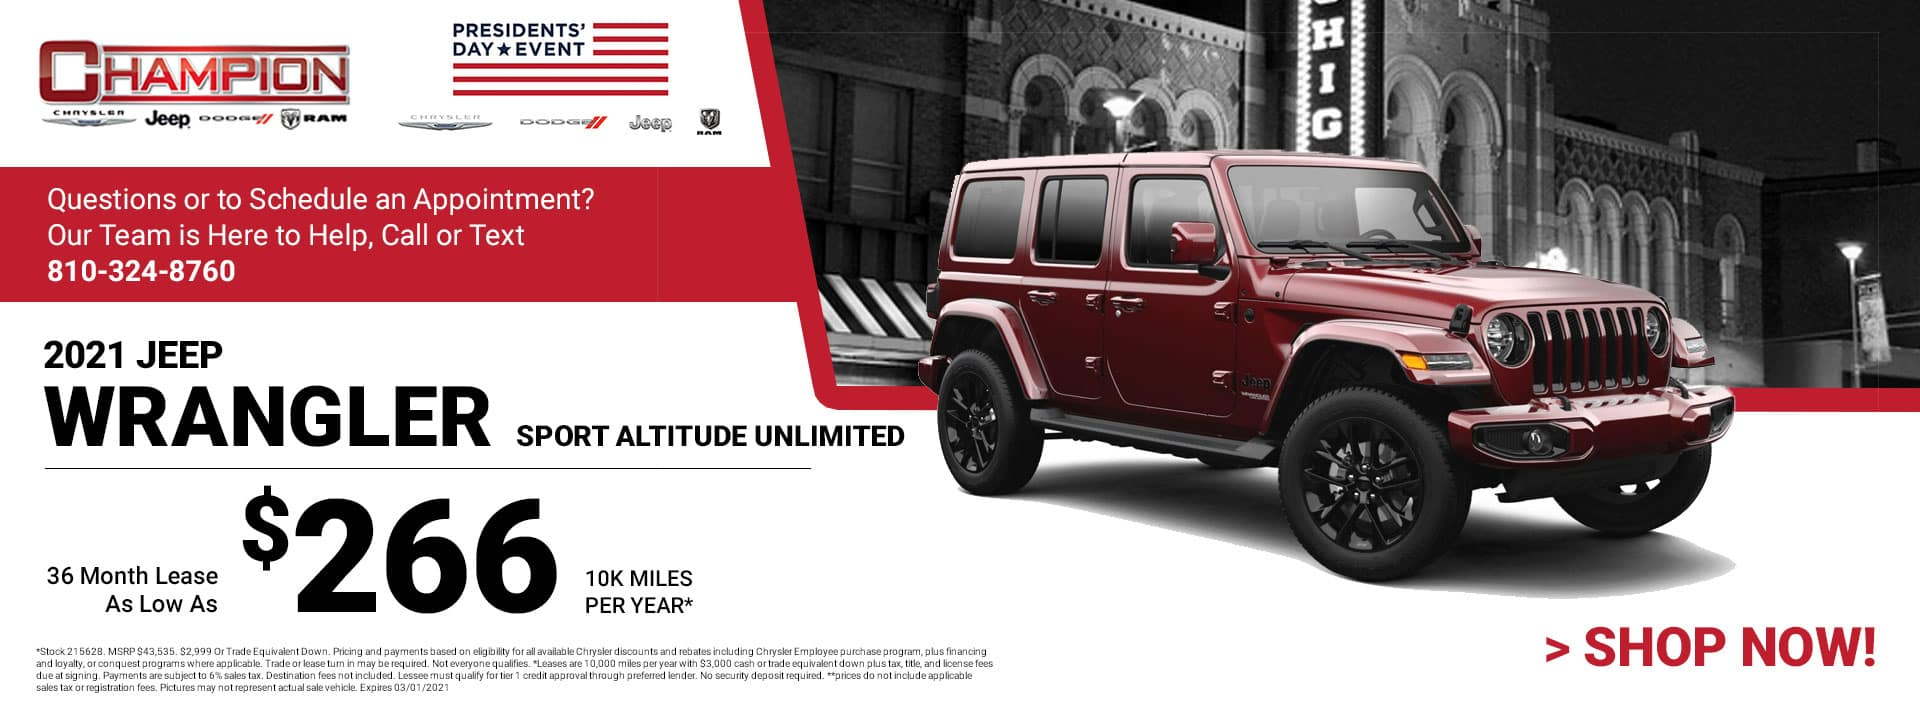 2021 Jeep Wrangler Sport Altitude Unlimited